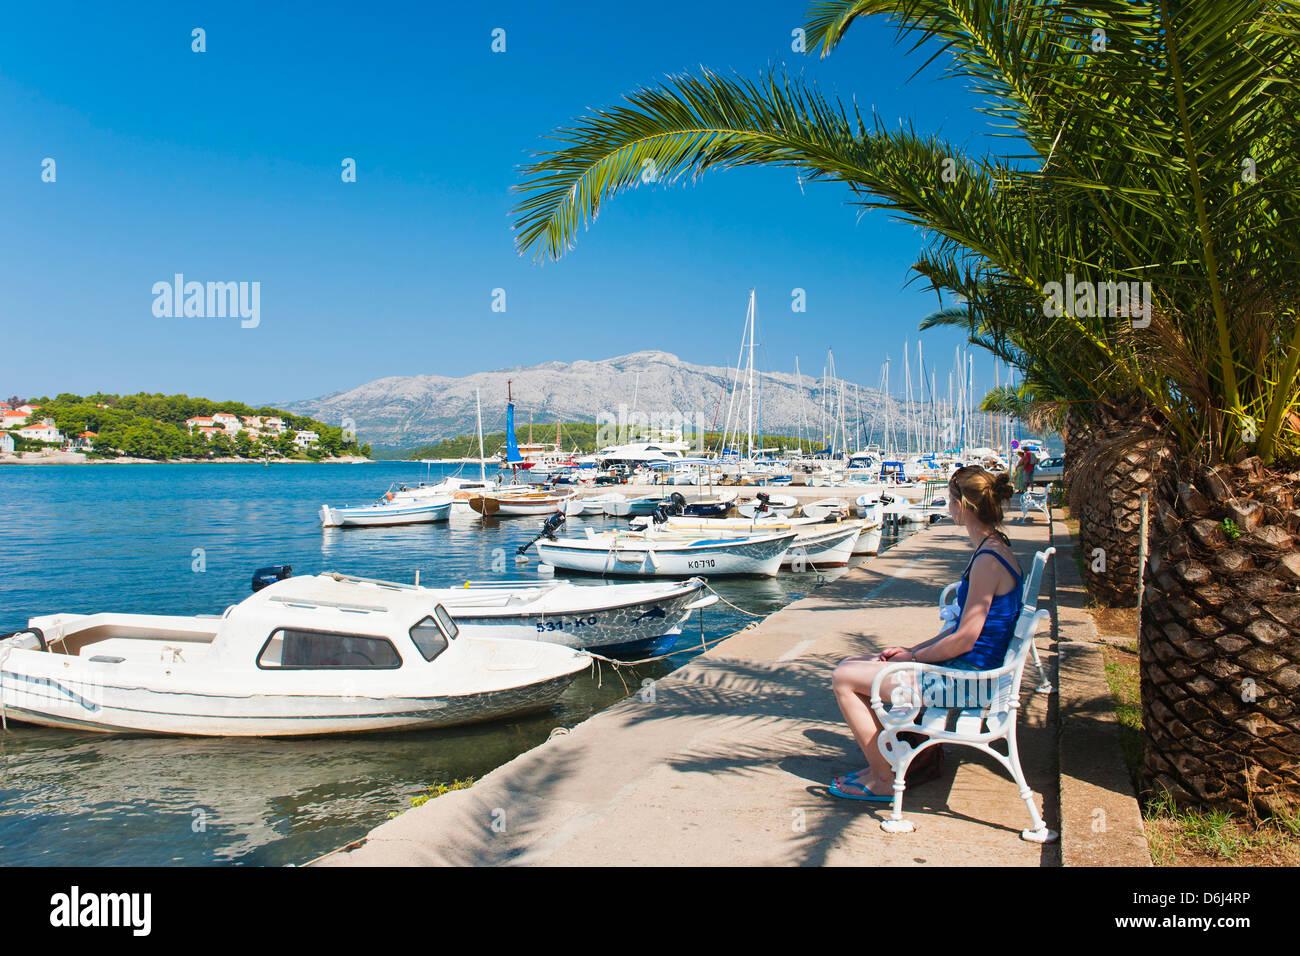 Tourist sitting in Lumbarda Harbor, Korcula Island, Dalmatian Coast, Adriatic, Croatia, Europe - Stock Image